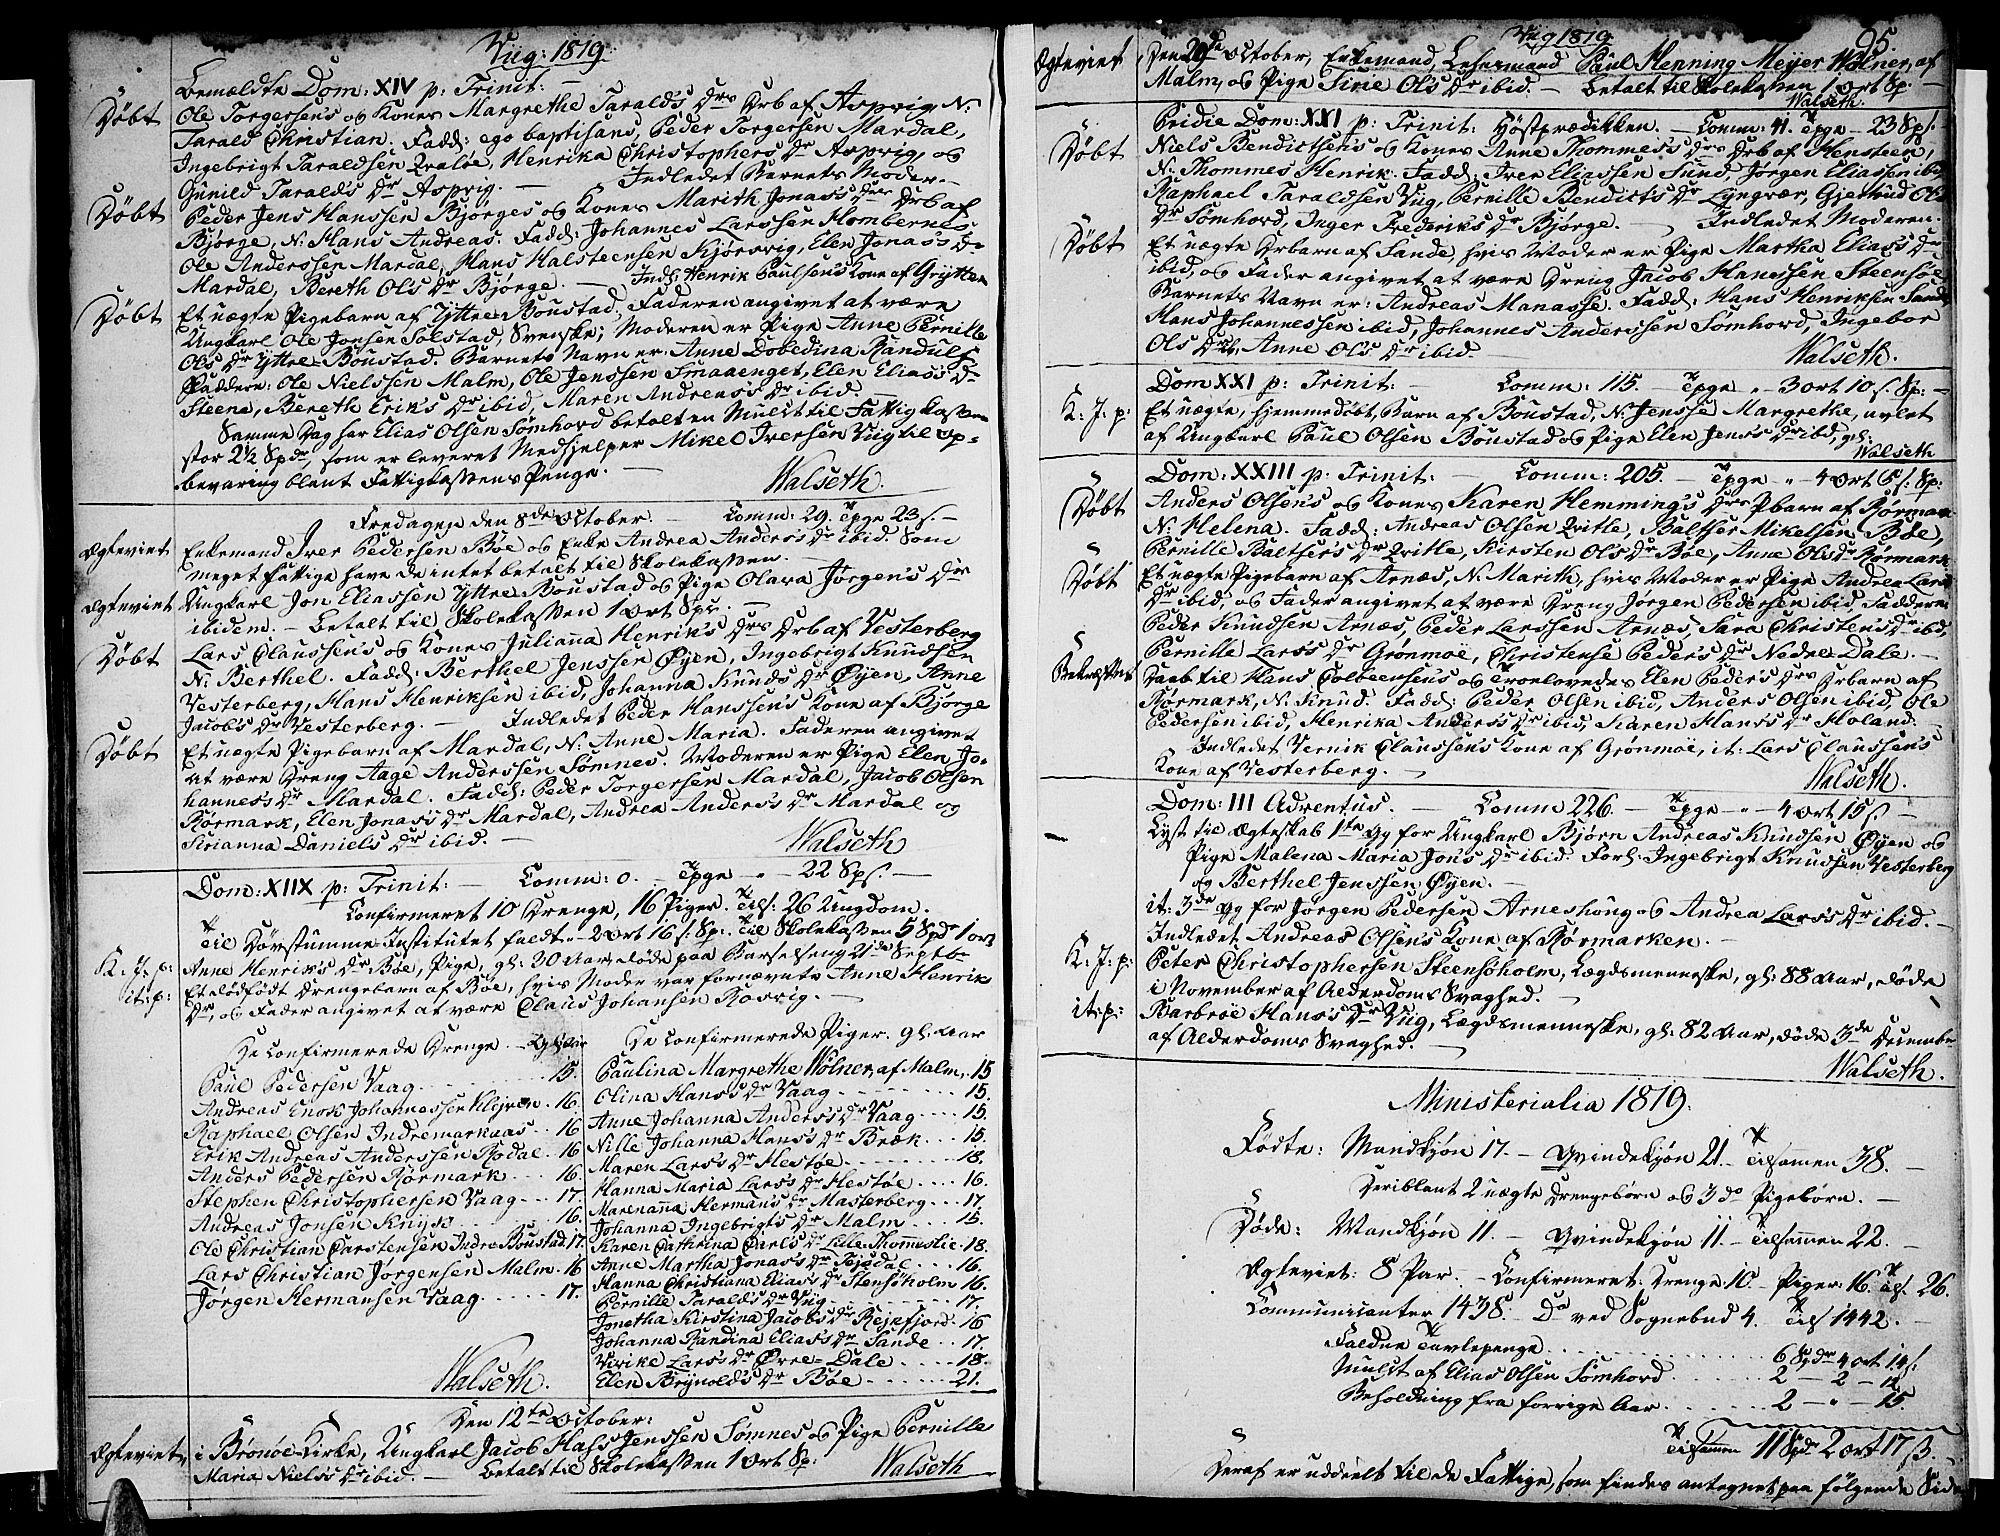 SAT, Ministerialprotokoller, klokkerbøker og fødselsregistre - Nordland, 812/L0174: Ministerialbok nr. 812A03, 1801-1819, s. 95